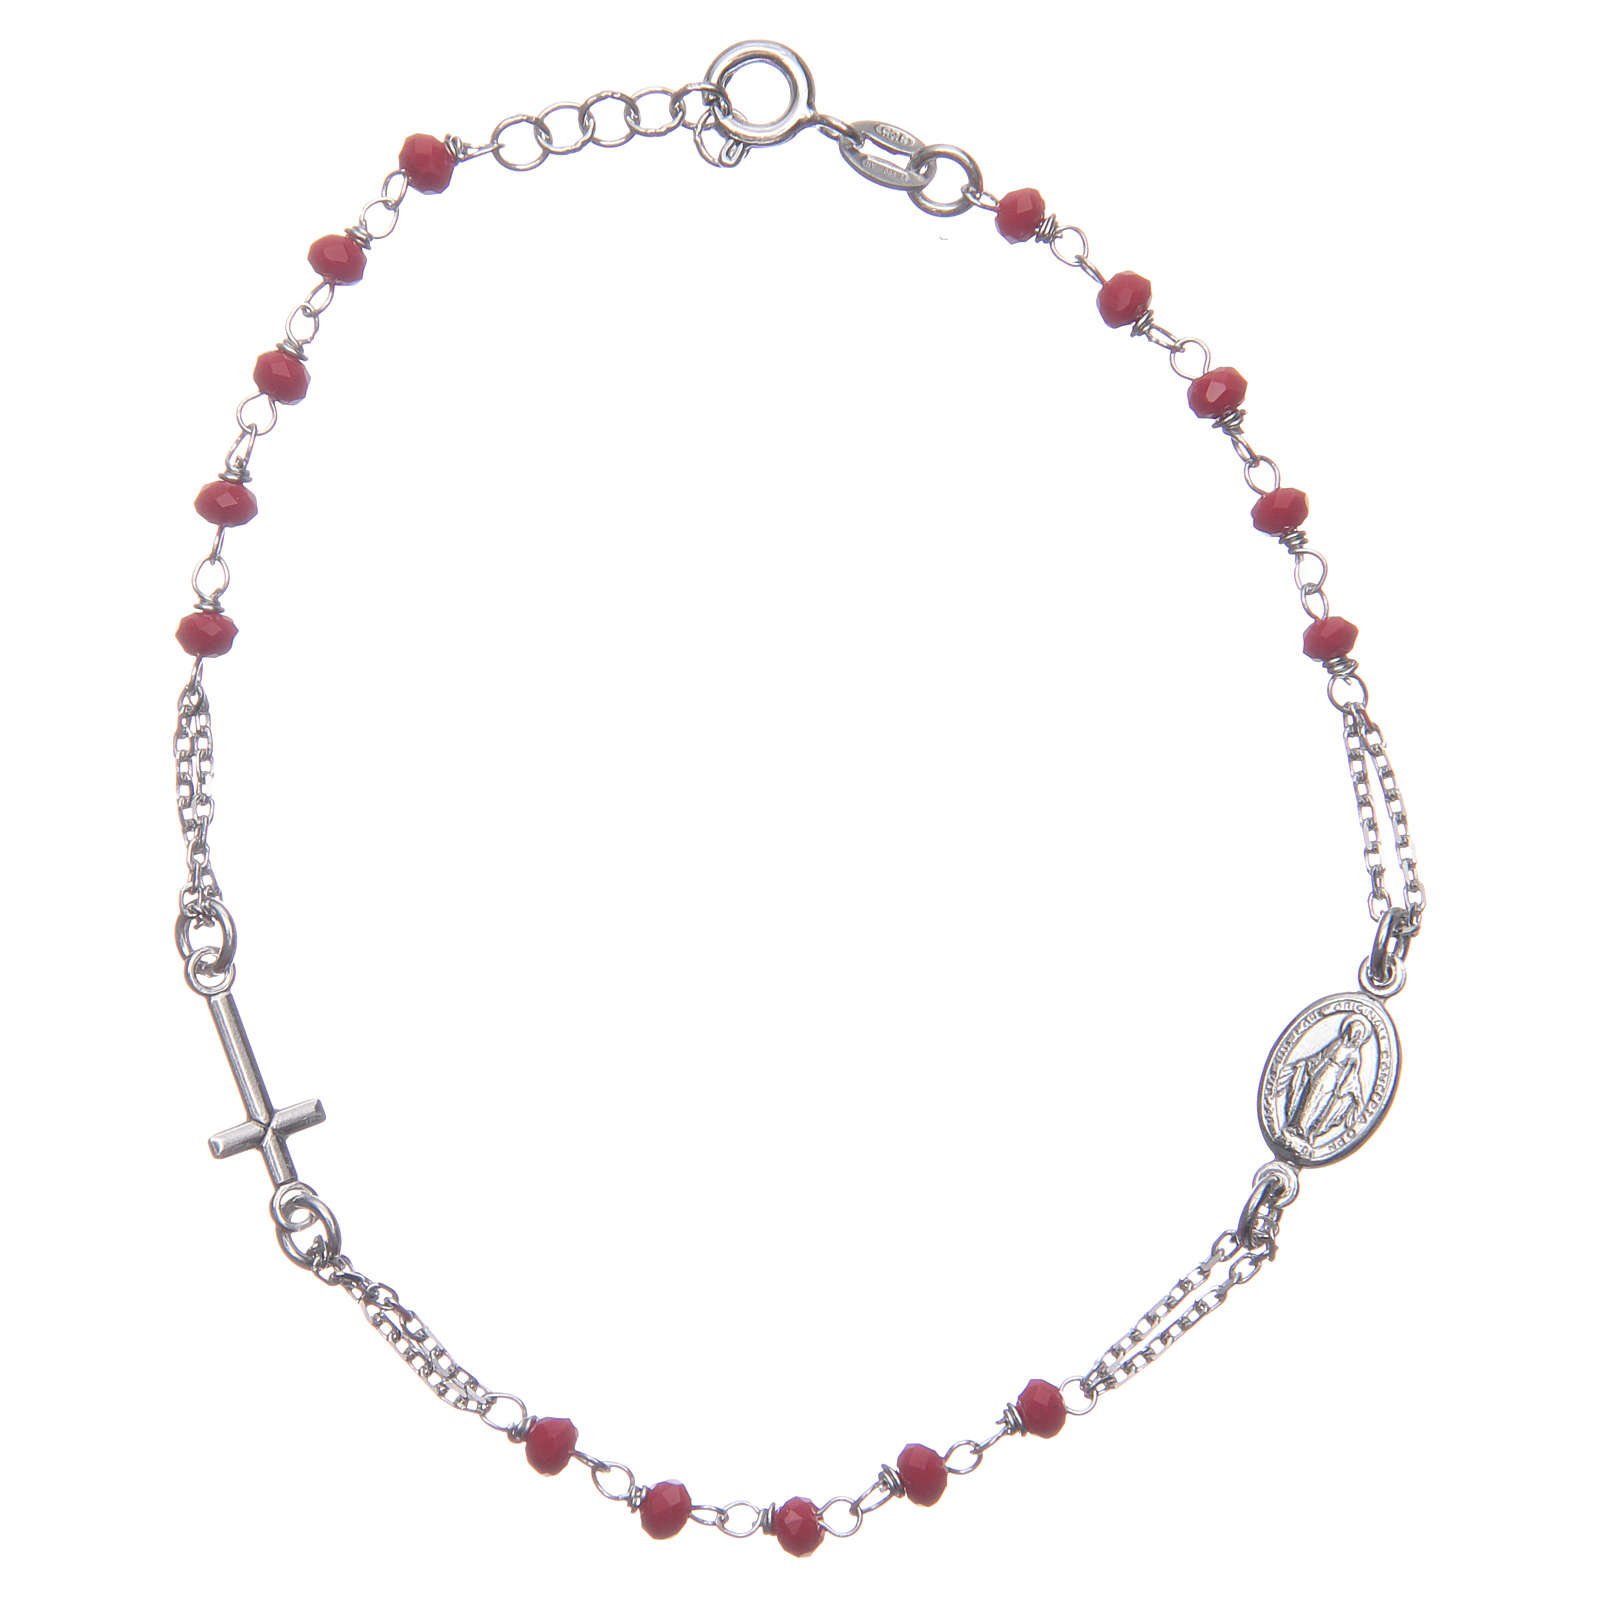 Bracciale rosario colore rosso argento 925 4